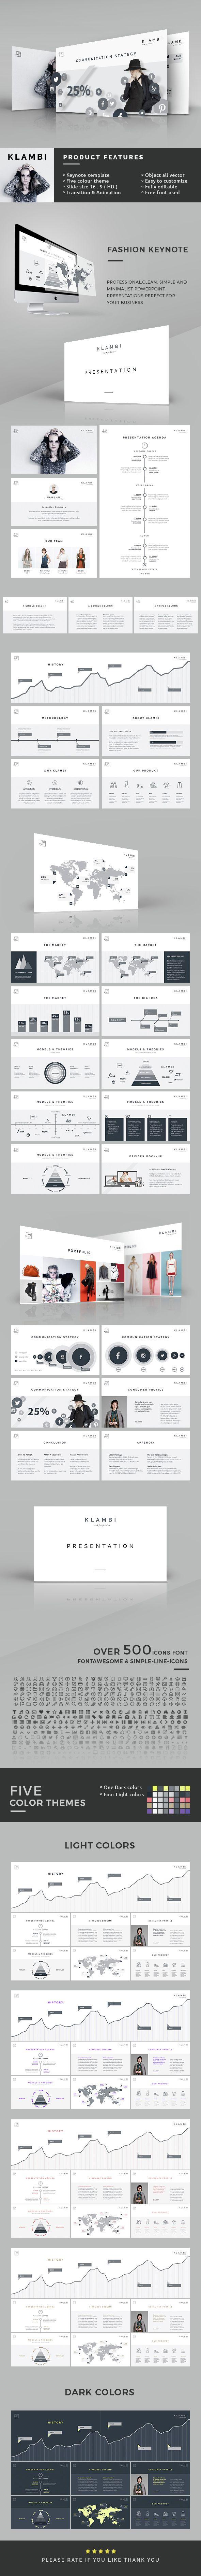 59 best beautiful powerpoint images on pinterest keynote template fashion keynote template toneelgroepblik Gallery